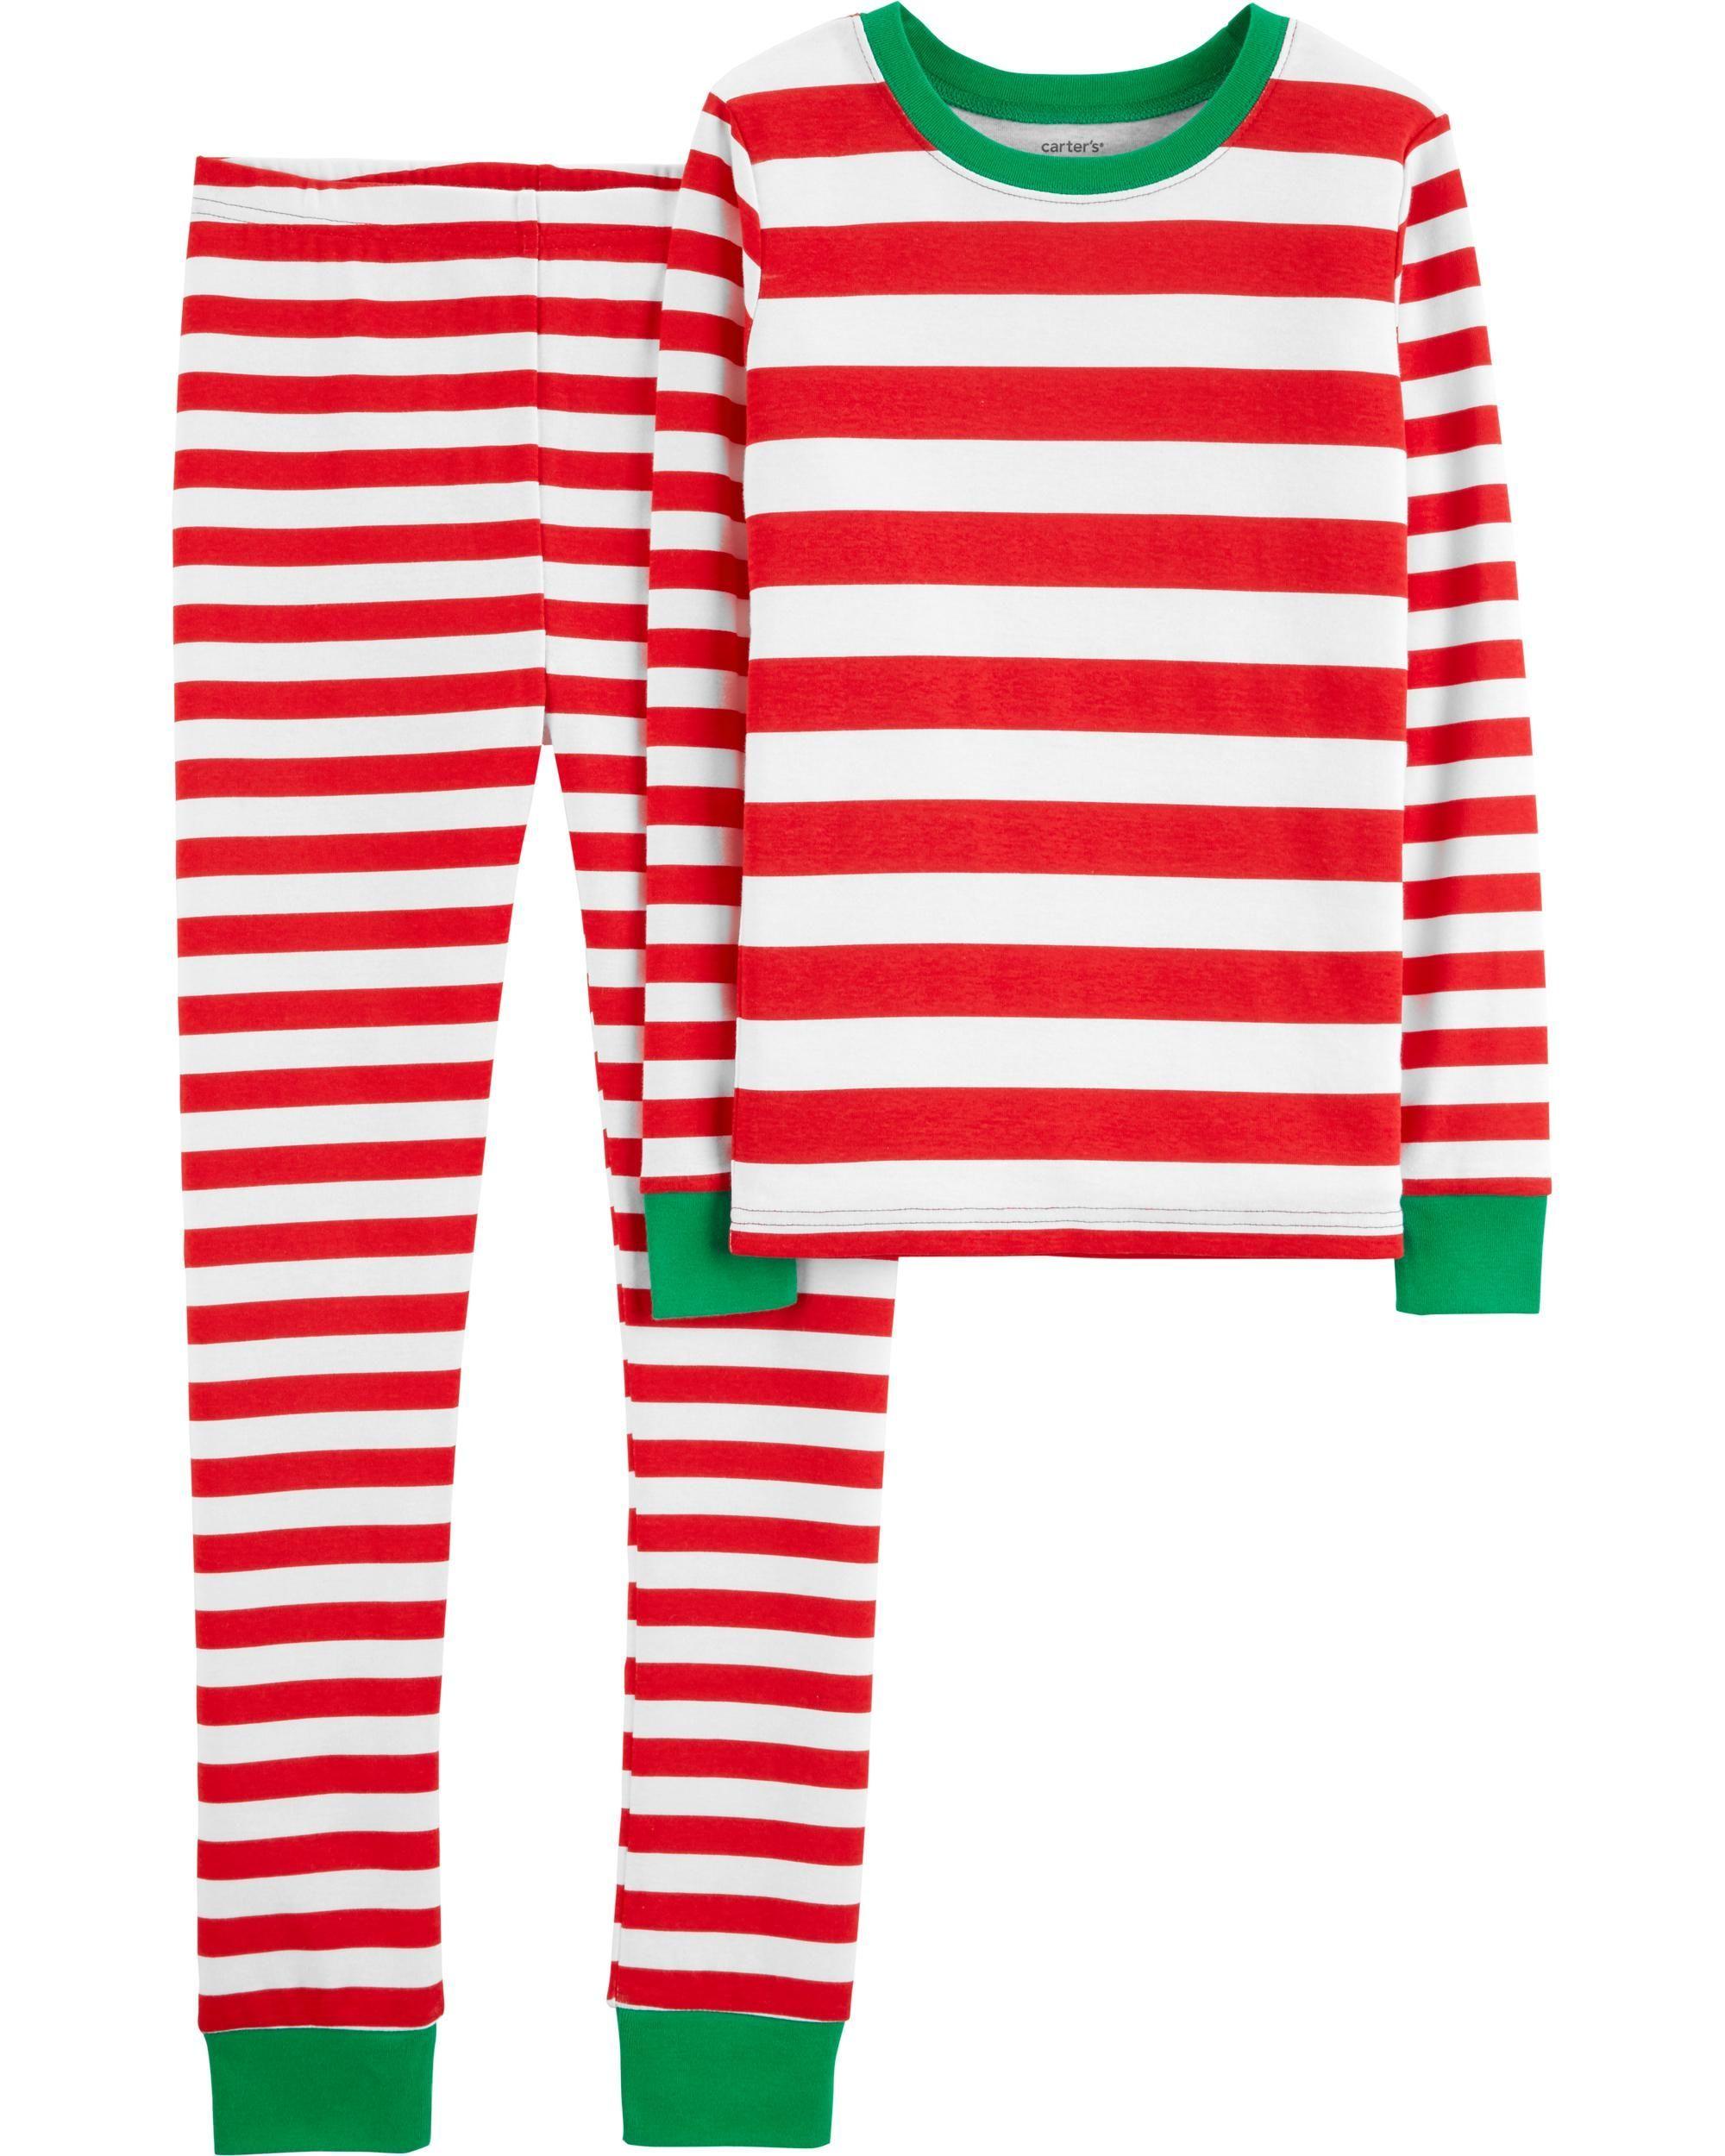 8b1704dab82e 2-Piece Christmas Snug Fit Cotton PJs